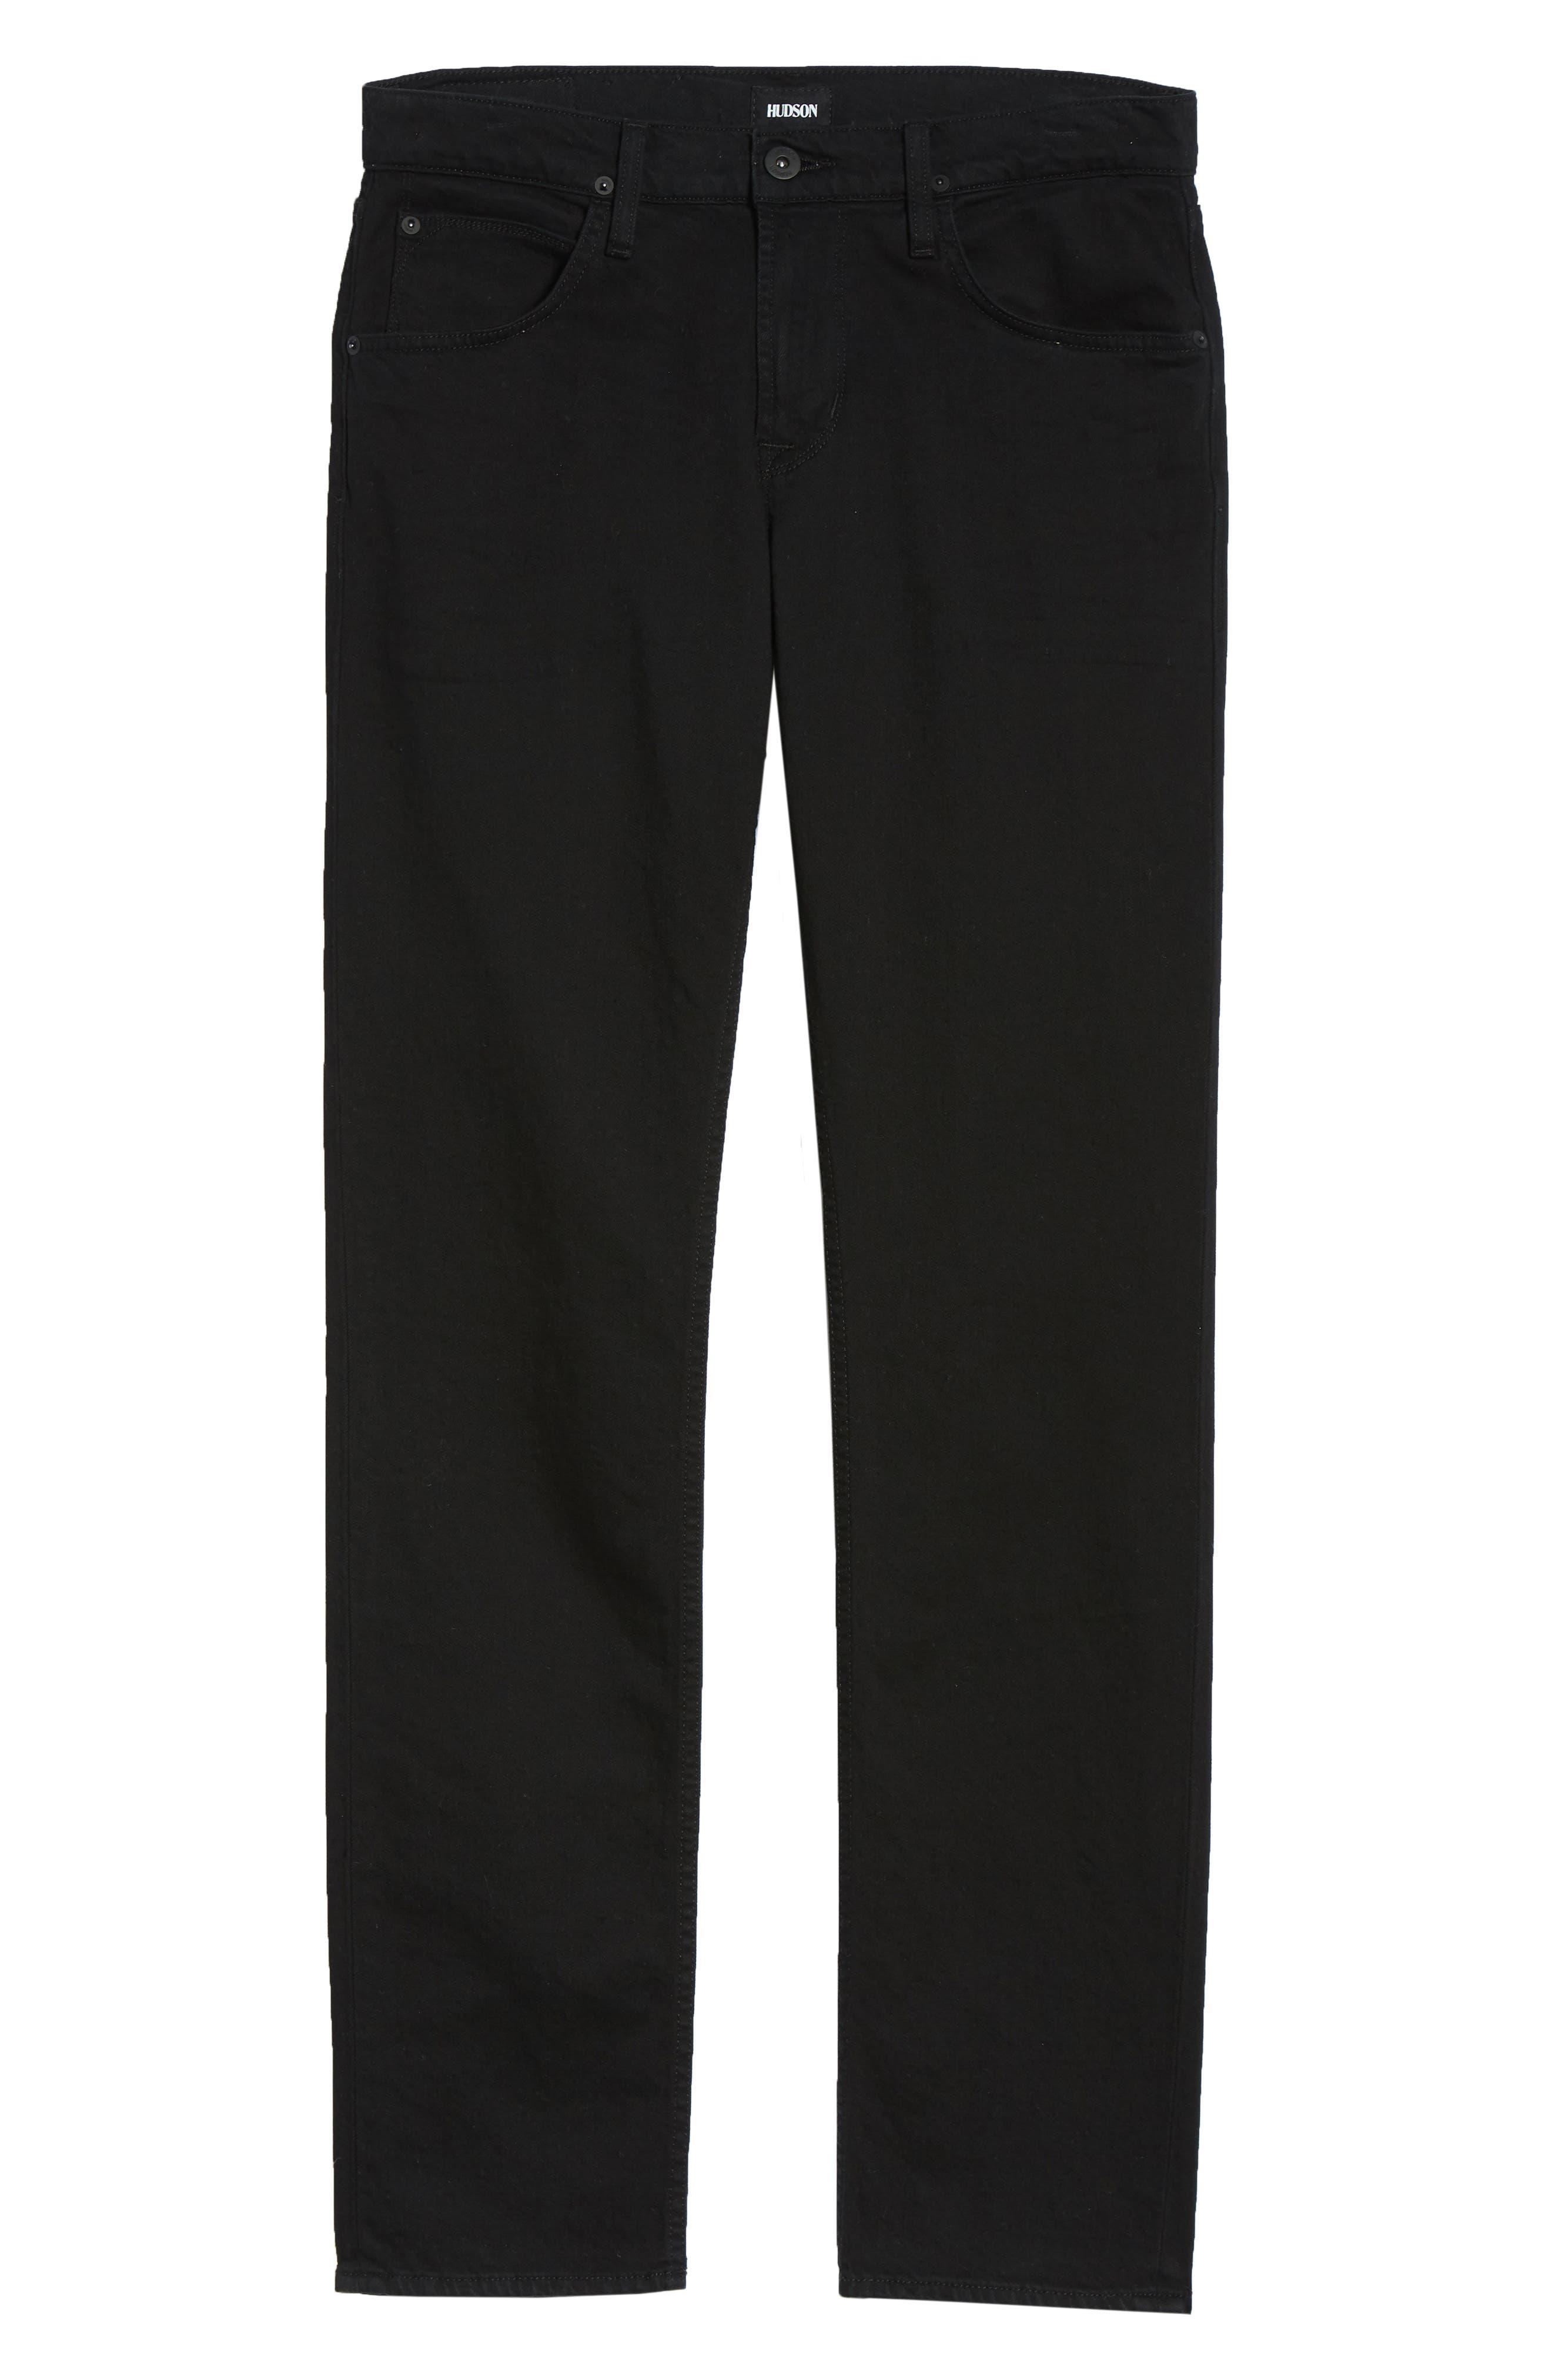 Blake Slim Fit Jeans,                             Alternate thumbnail 6, color,                             002